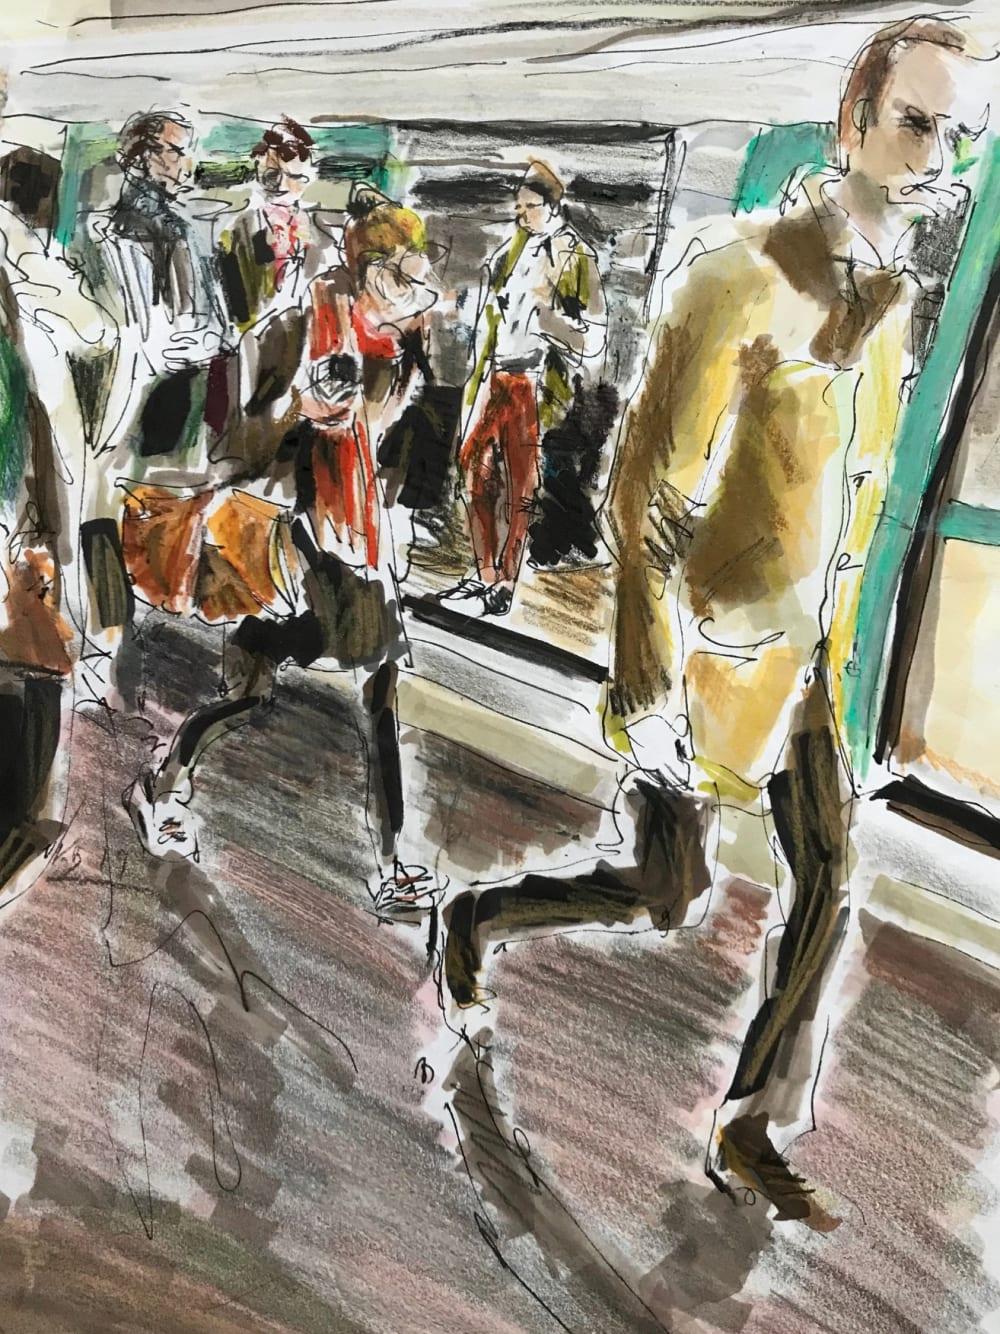 Sortie dans le métro - Karin Boinet